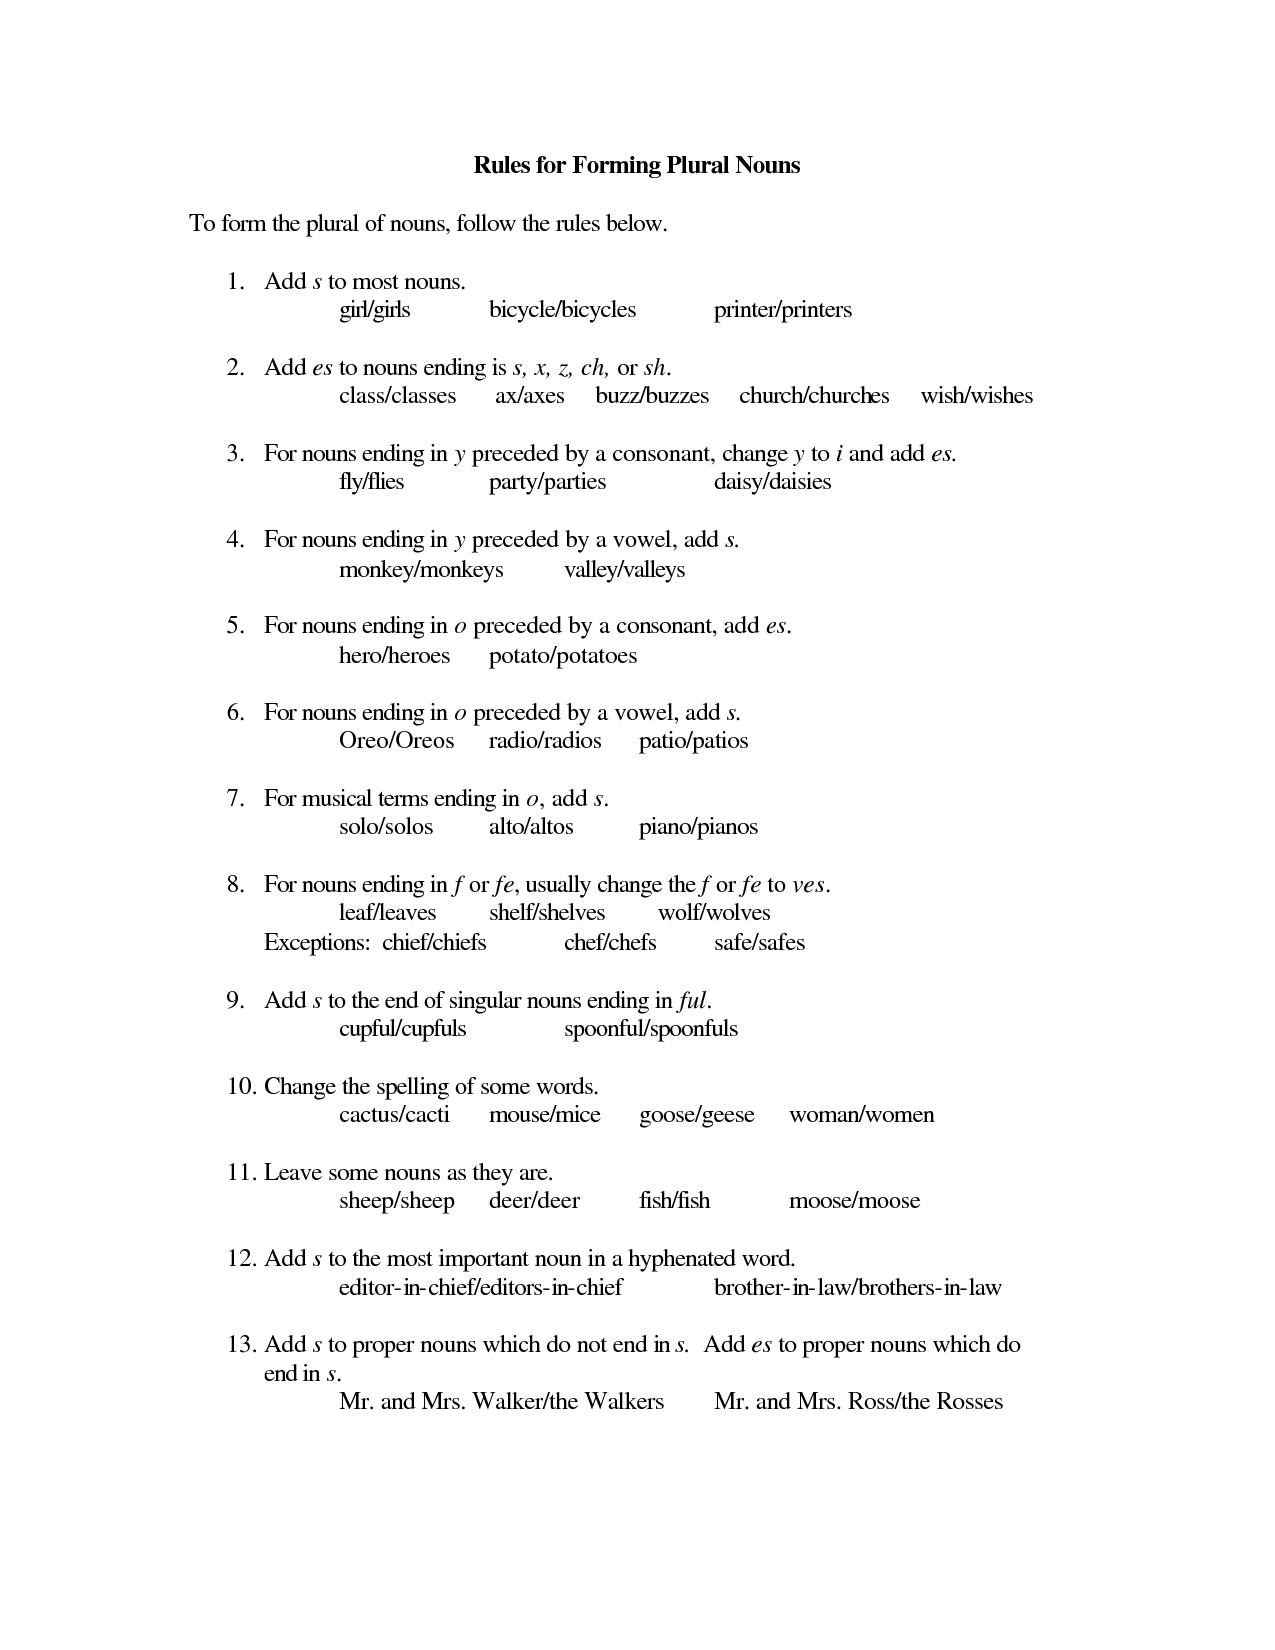 Common Proper Nouns Worksheet